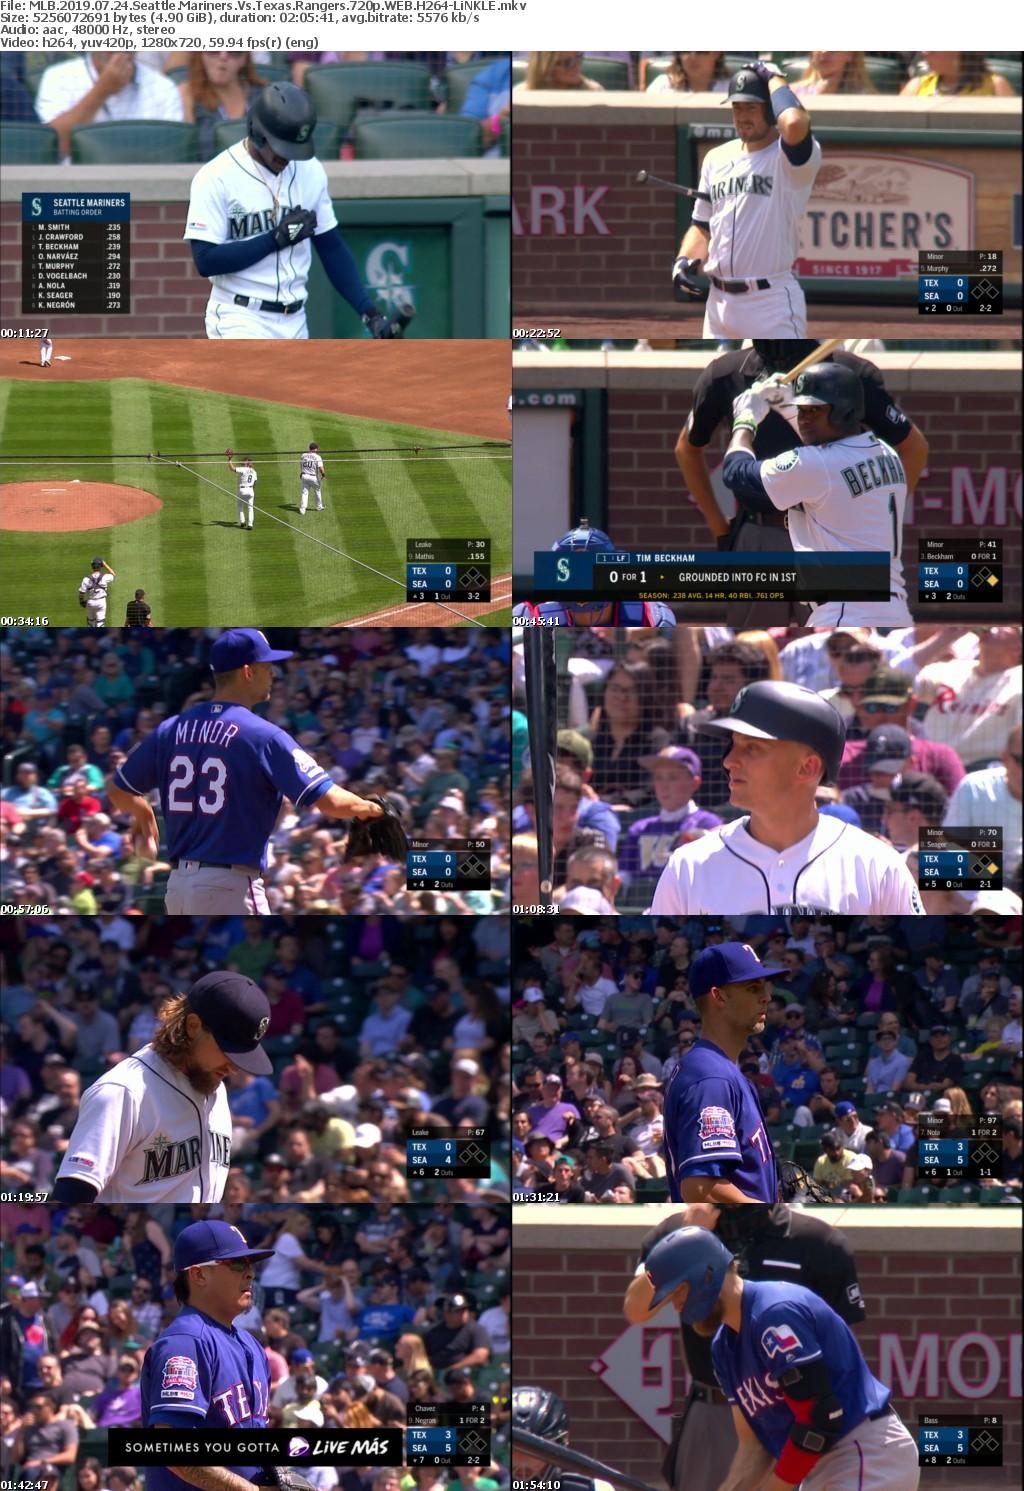 MLB 2019 07 24 Seattle Mariners Vs Texas Rangers 720p WEB H264-LiNKLE